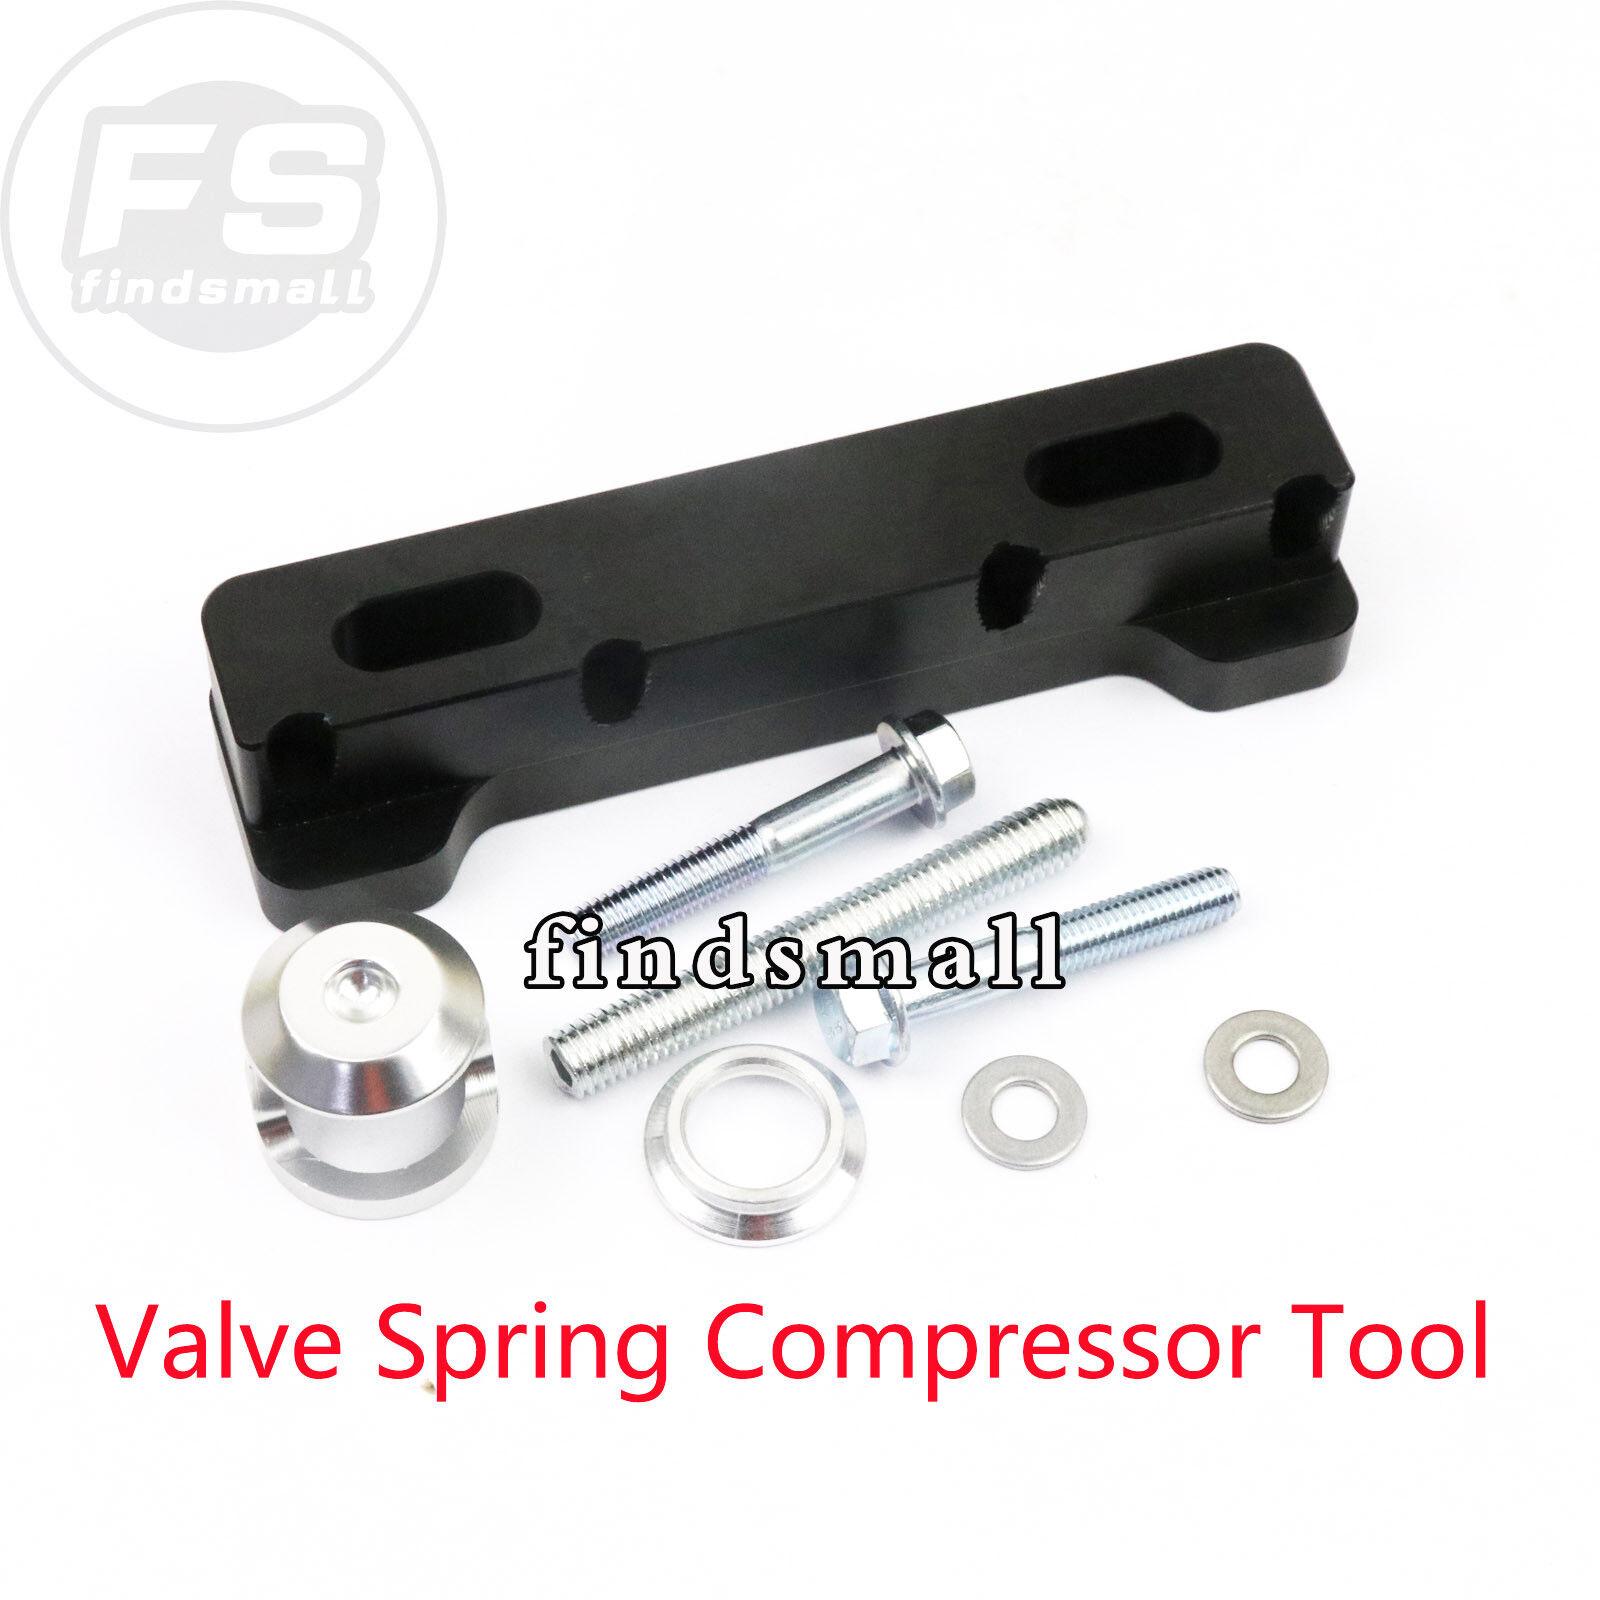 New Valve Spring Compressor Tool For 1990-1999 Mitsubishi